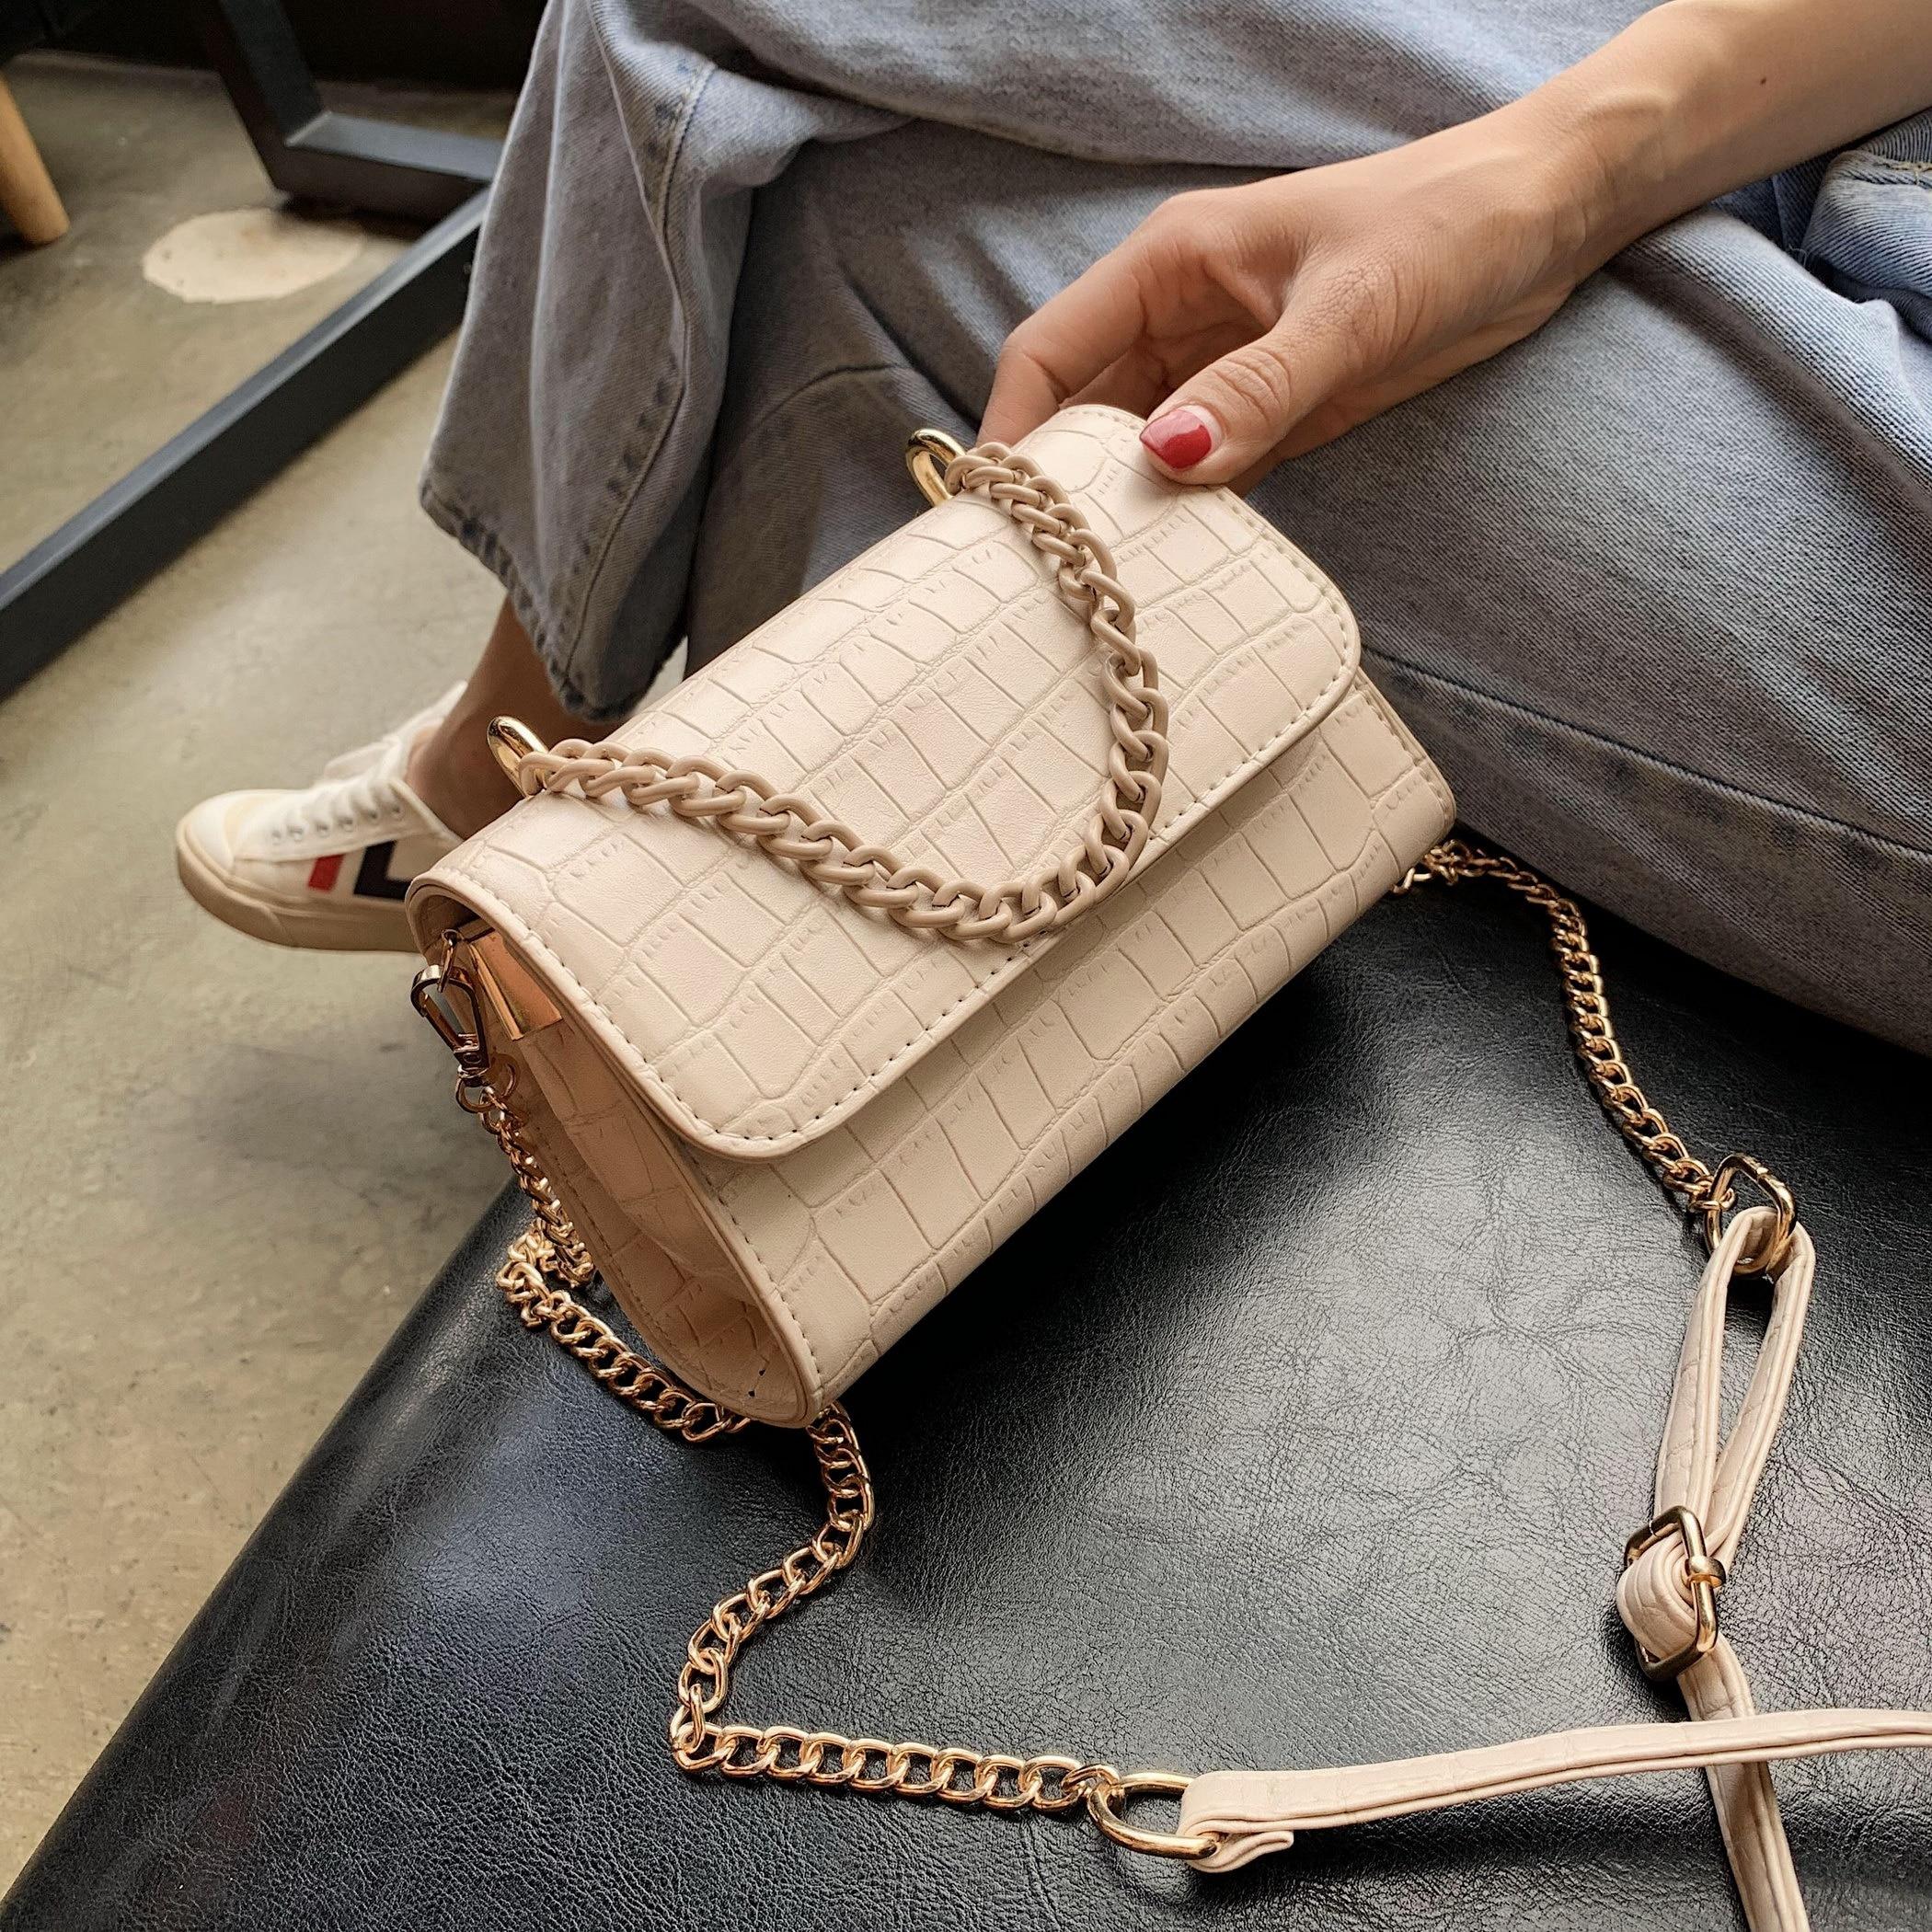 Stone Pattern PU Leather Candy Color Chain Cute Crossbody Bags For Women 2020 Summer Shoulder Handbags Female Handbag